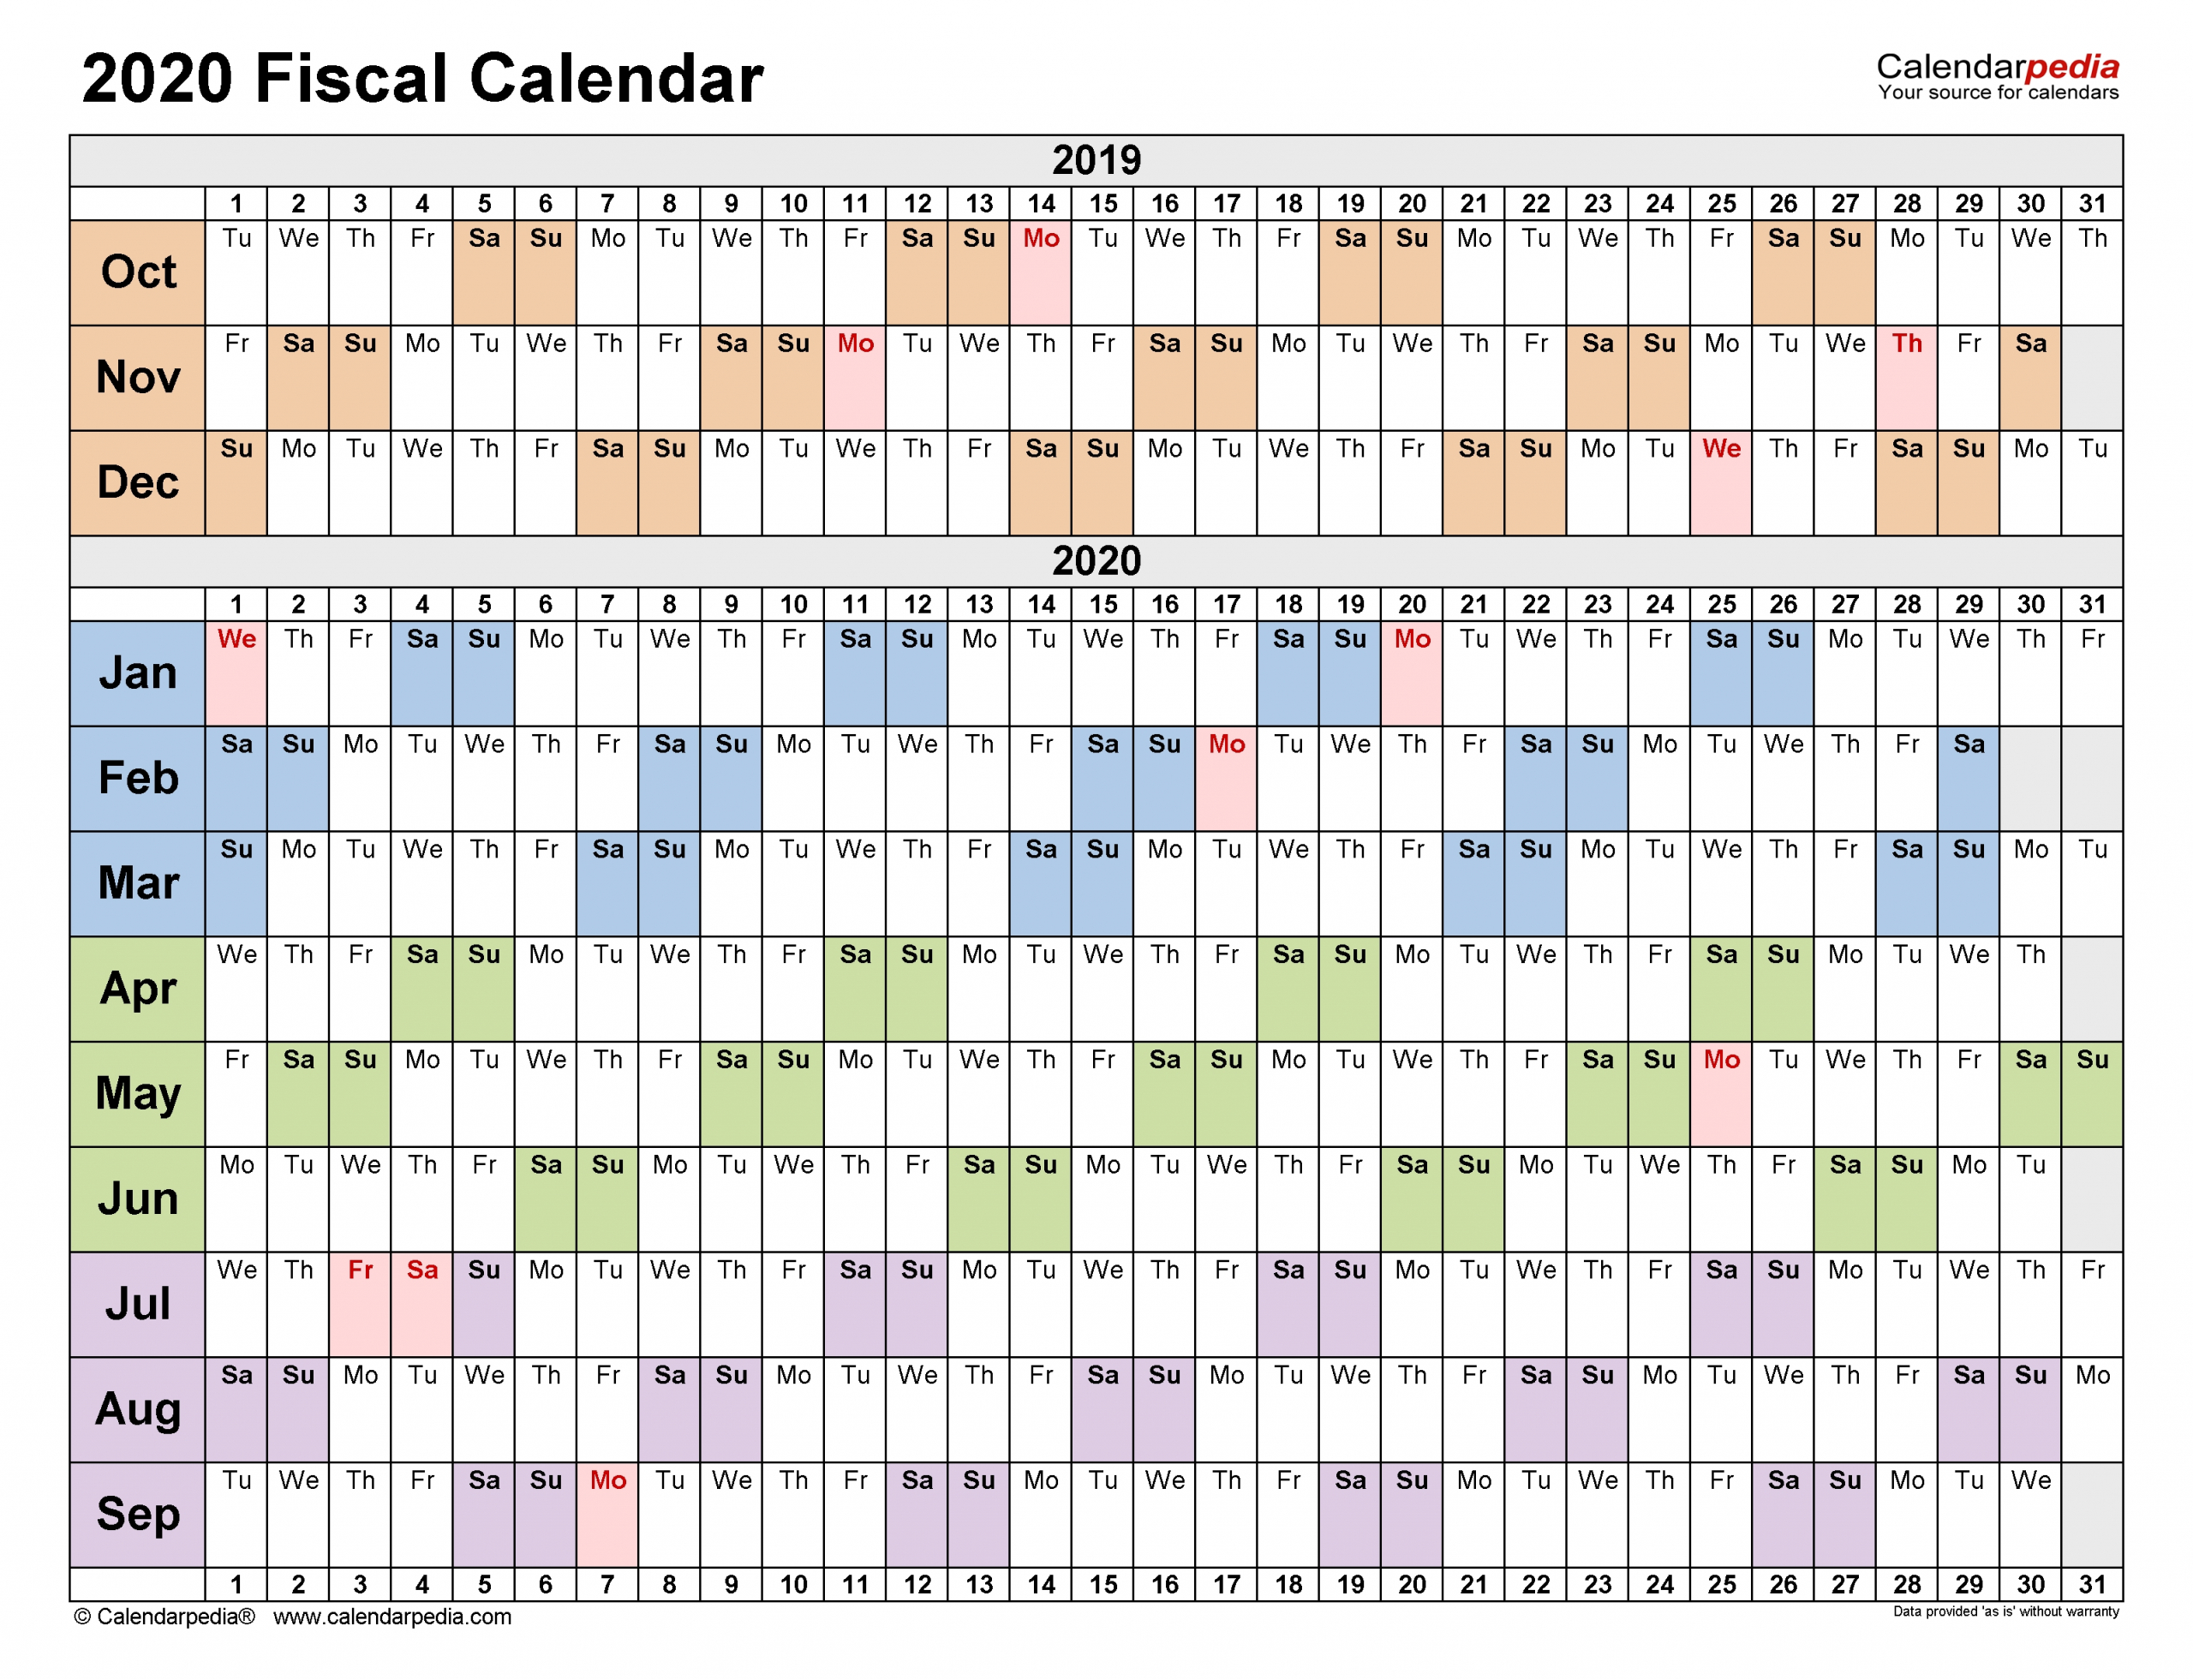 Julian Weekly Date Code 2021 - Template Calendar Design  Julian Code 9197 For 2021